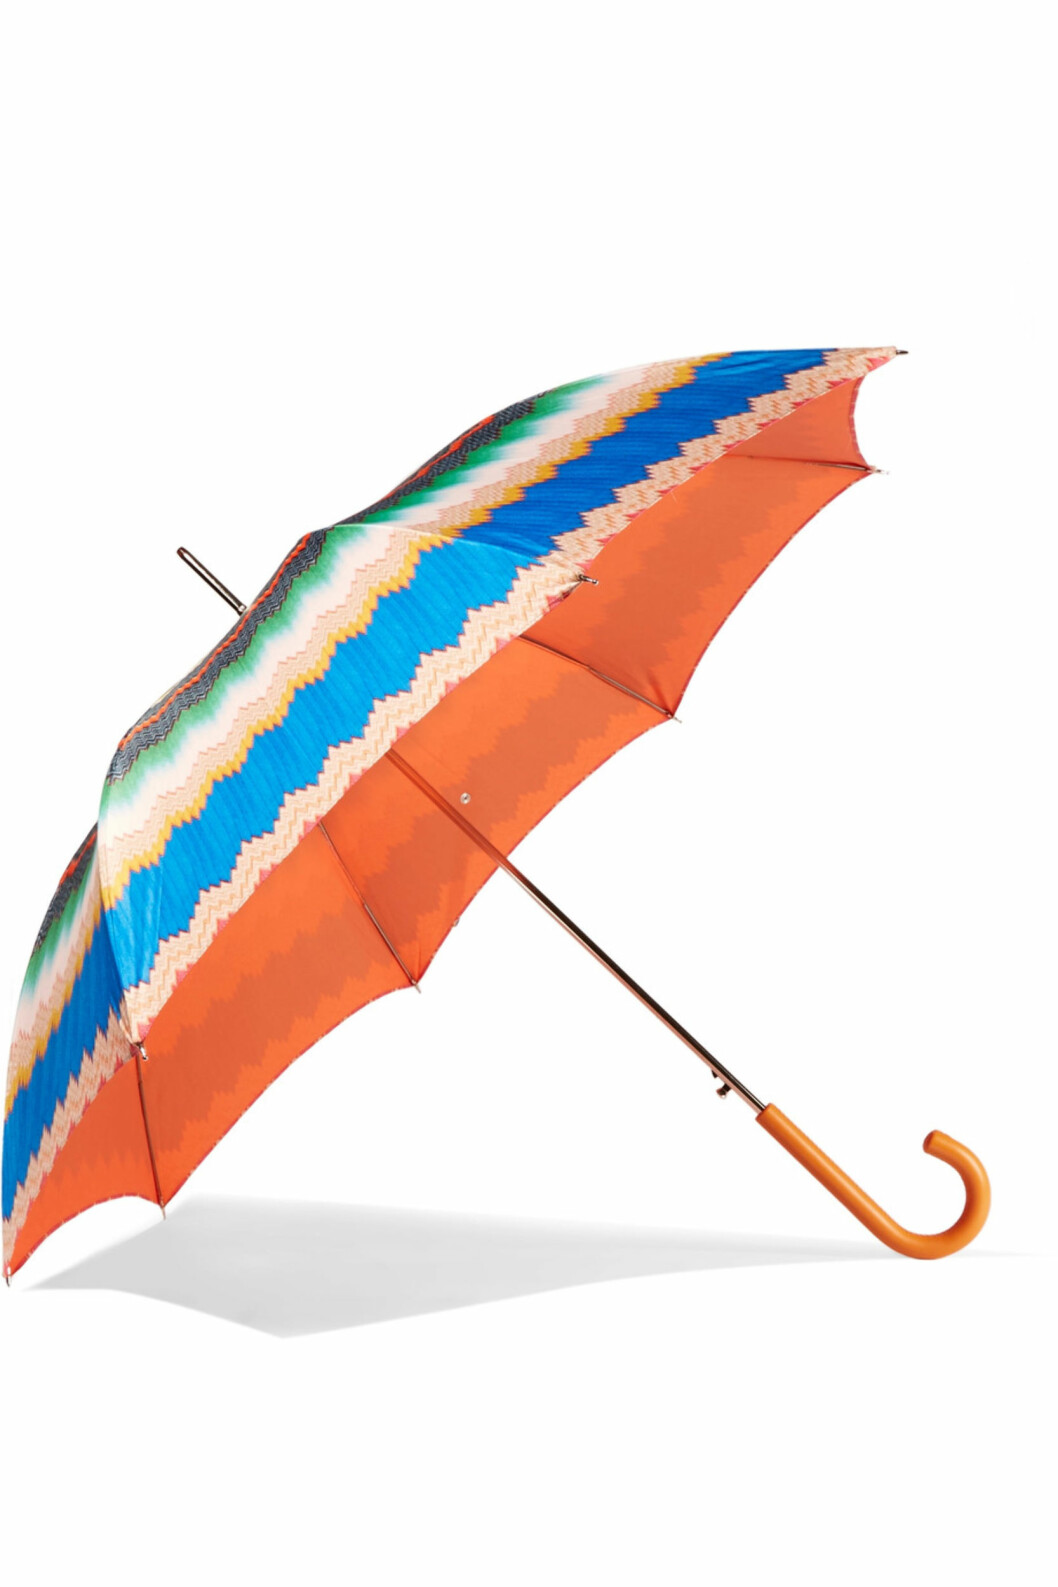 Paraply fra Missoni |kr 1380 | http://apprl.com/sv/pd/4MSC/